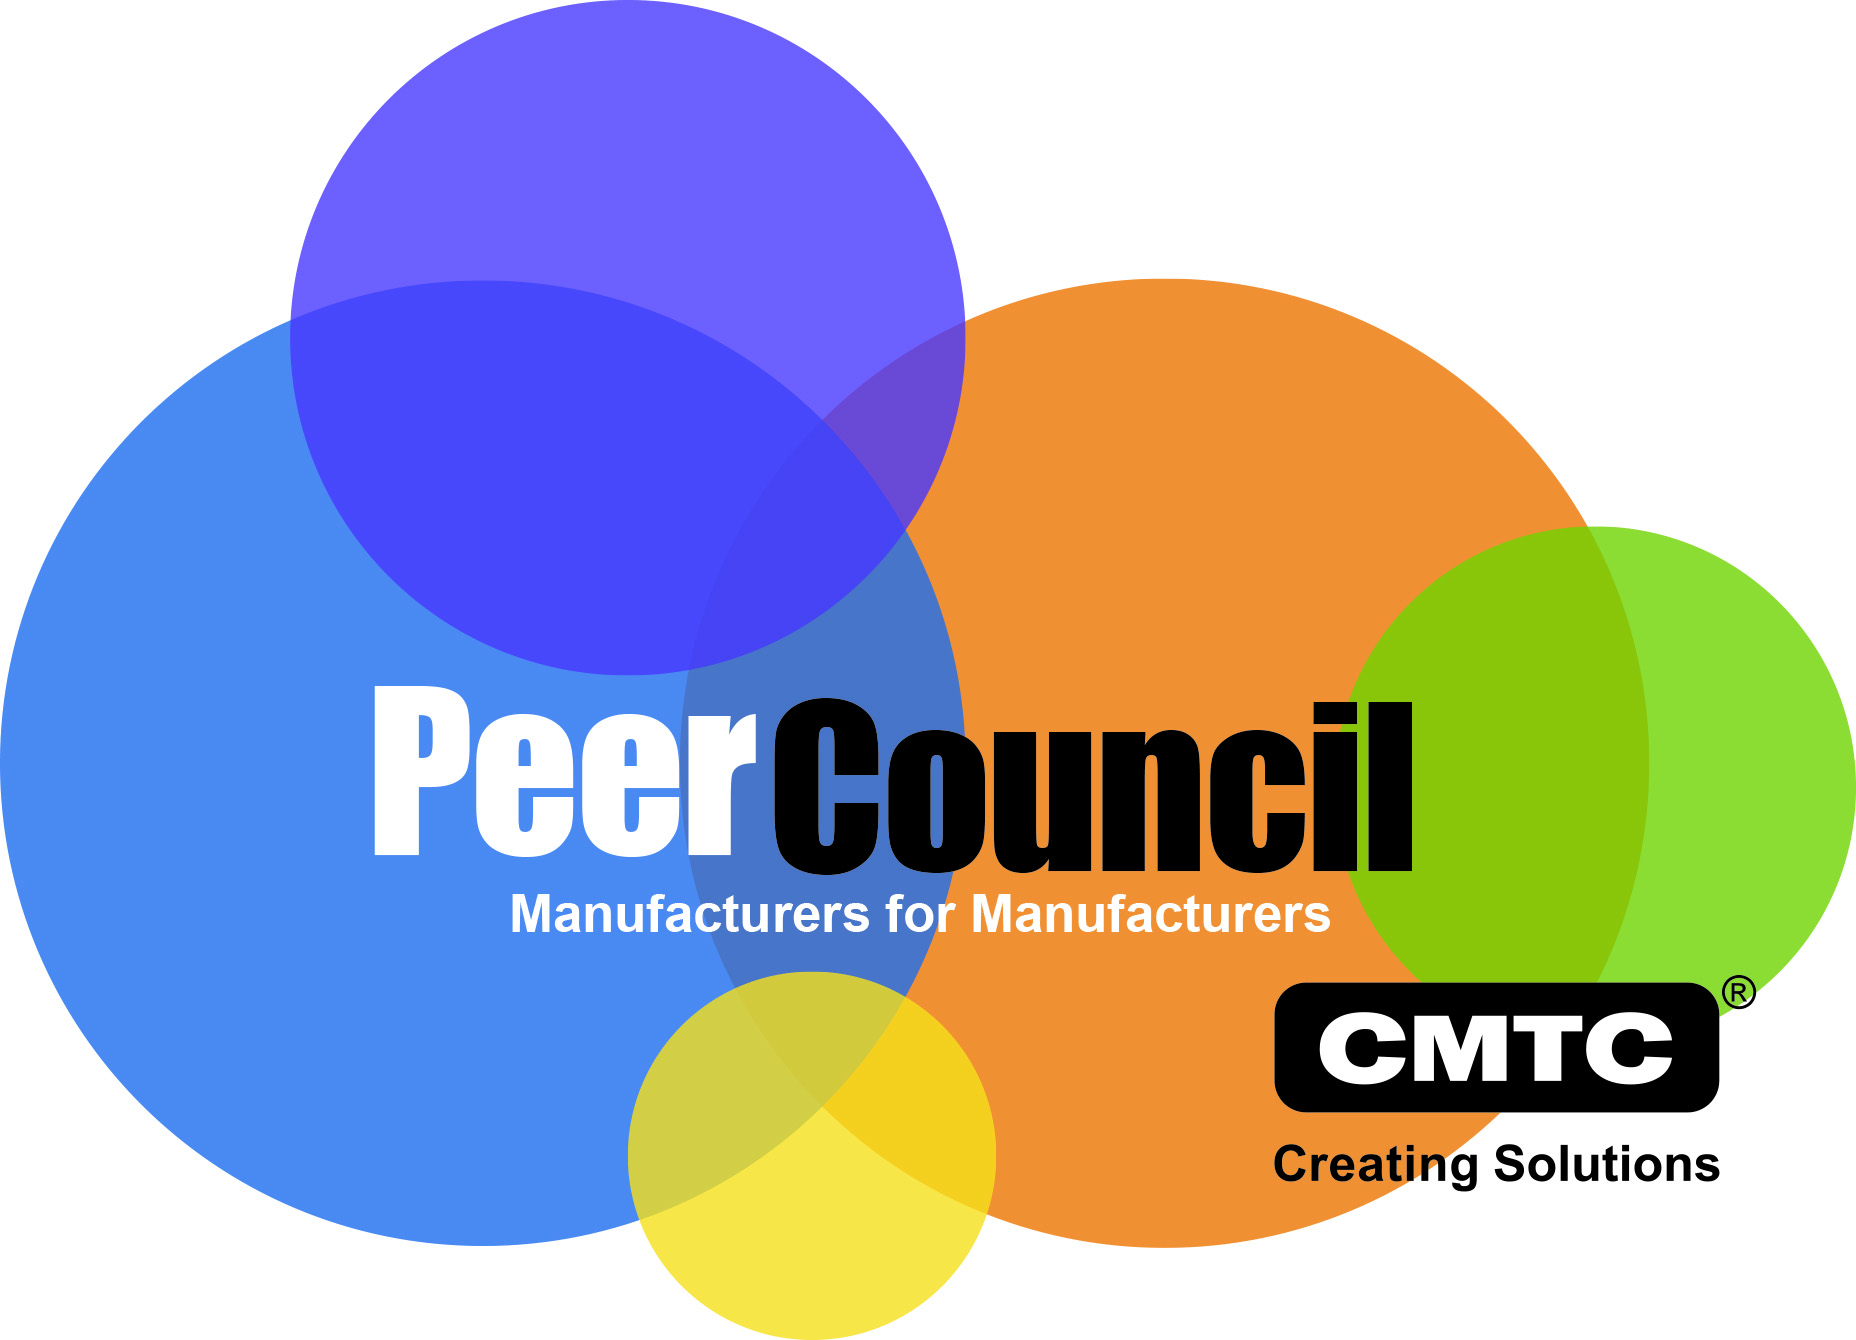 CMTC_Peercouncil_logo7_CMYK_3-26-14_3_jpg_image.jpg